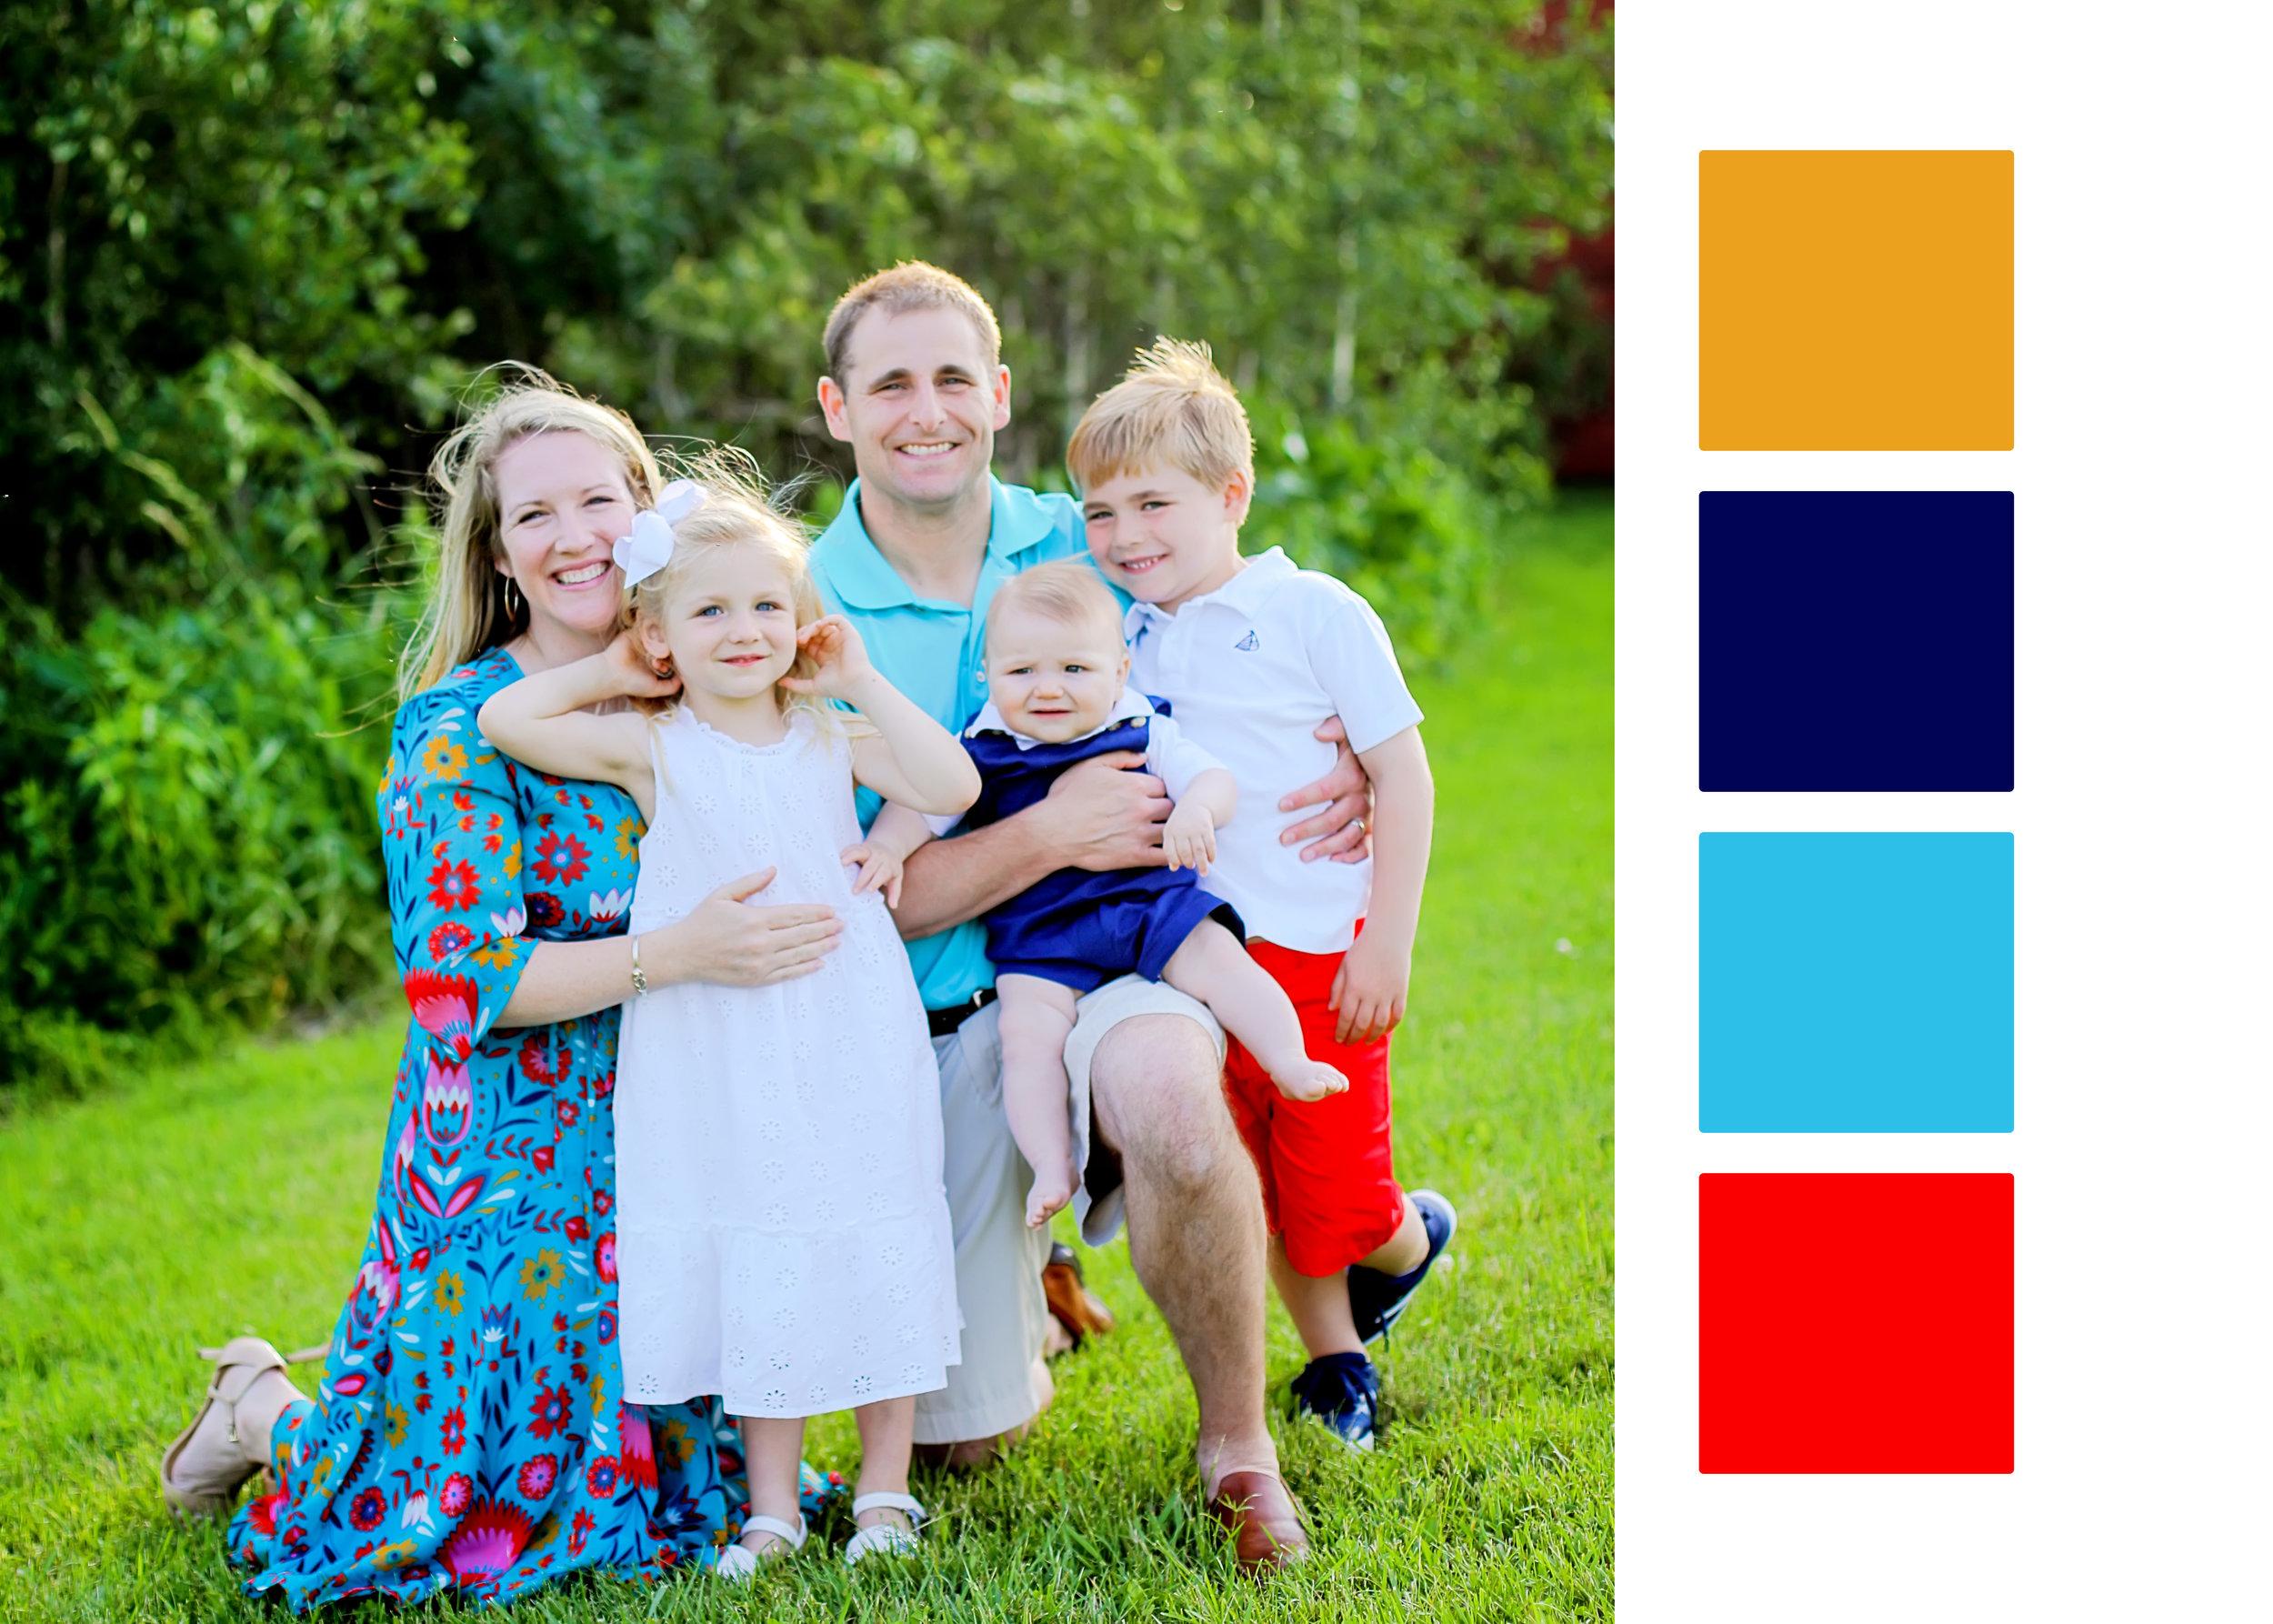 bright primary color scheme for portraits.jpg